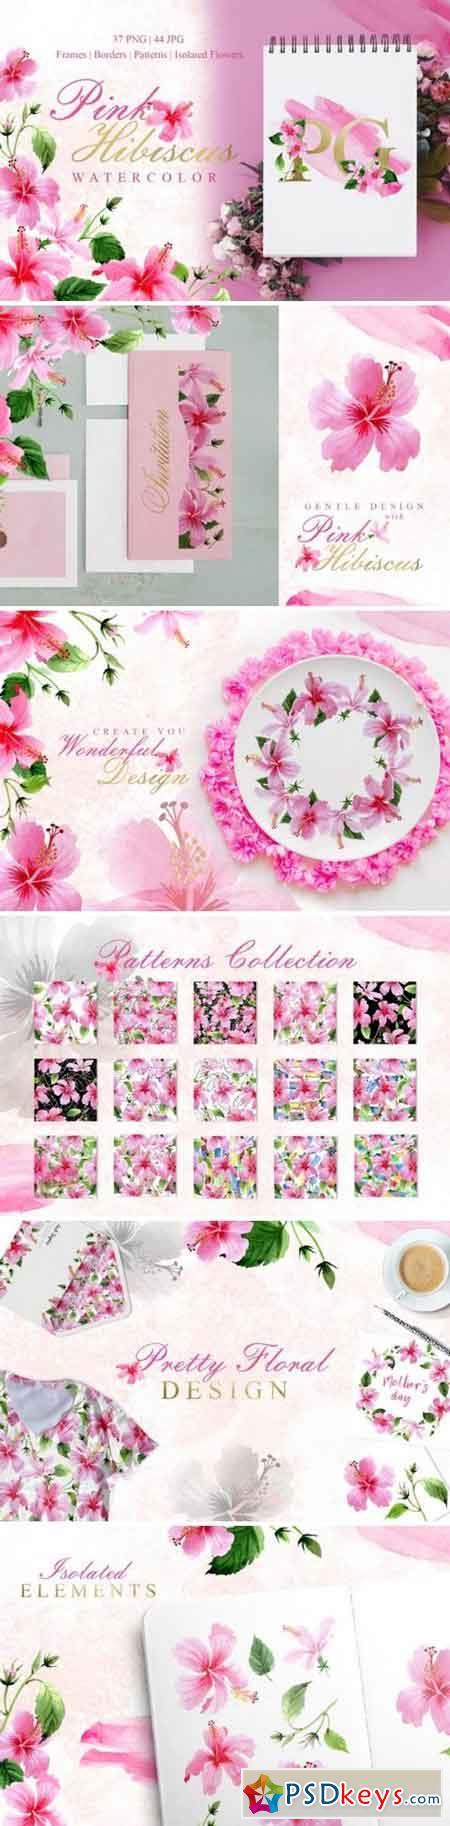 Pink Hibiscus Watercolor png 3357013